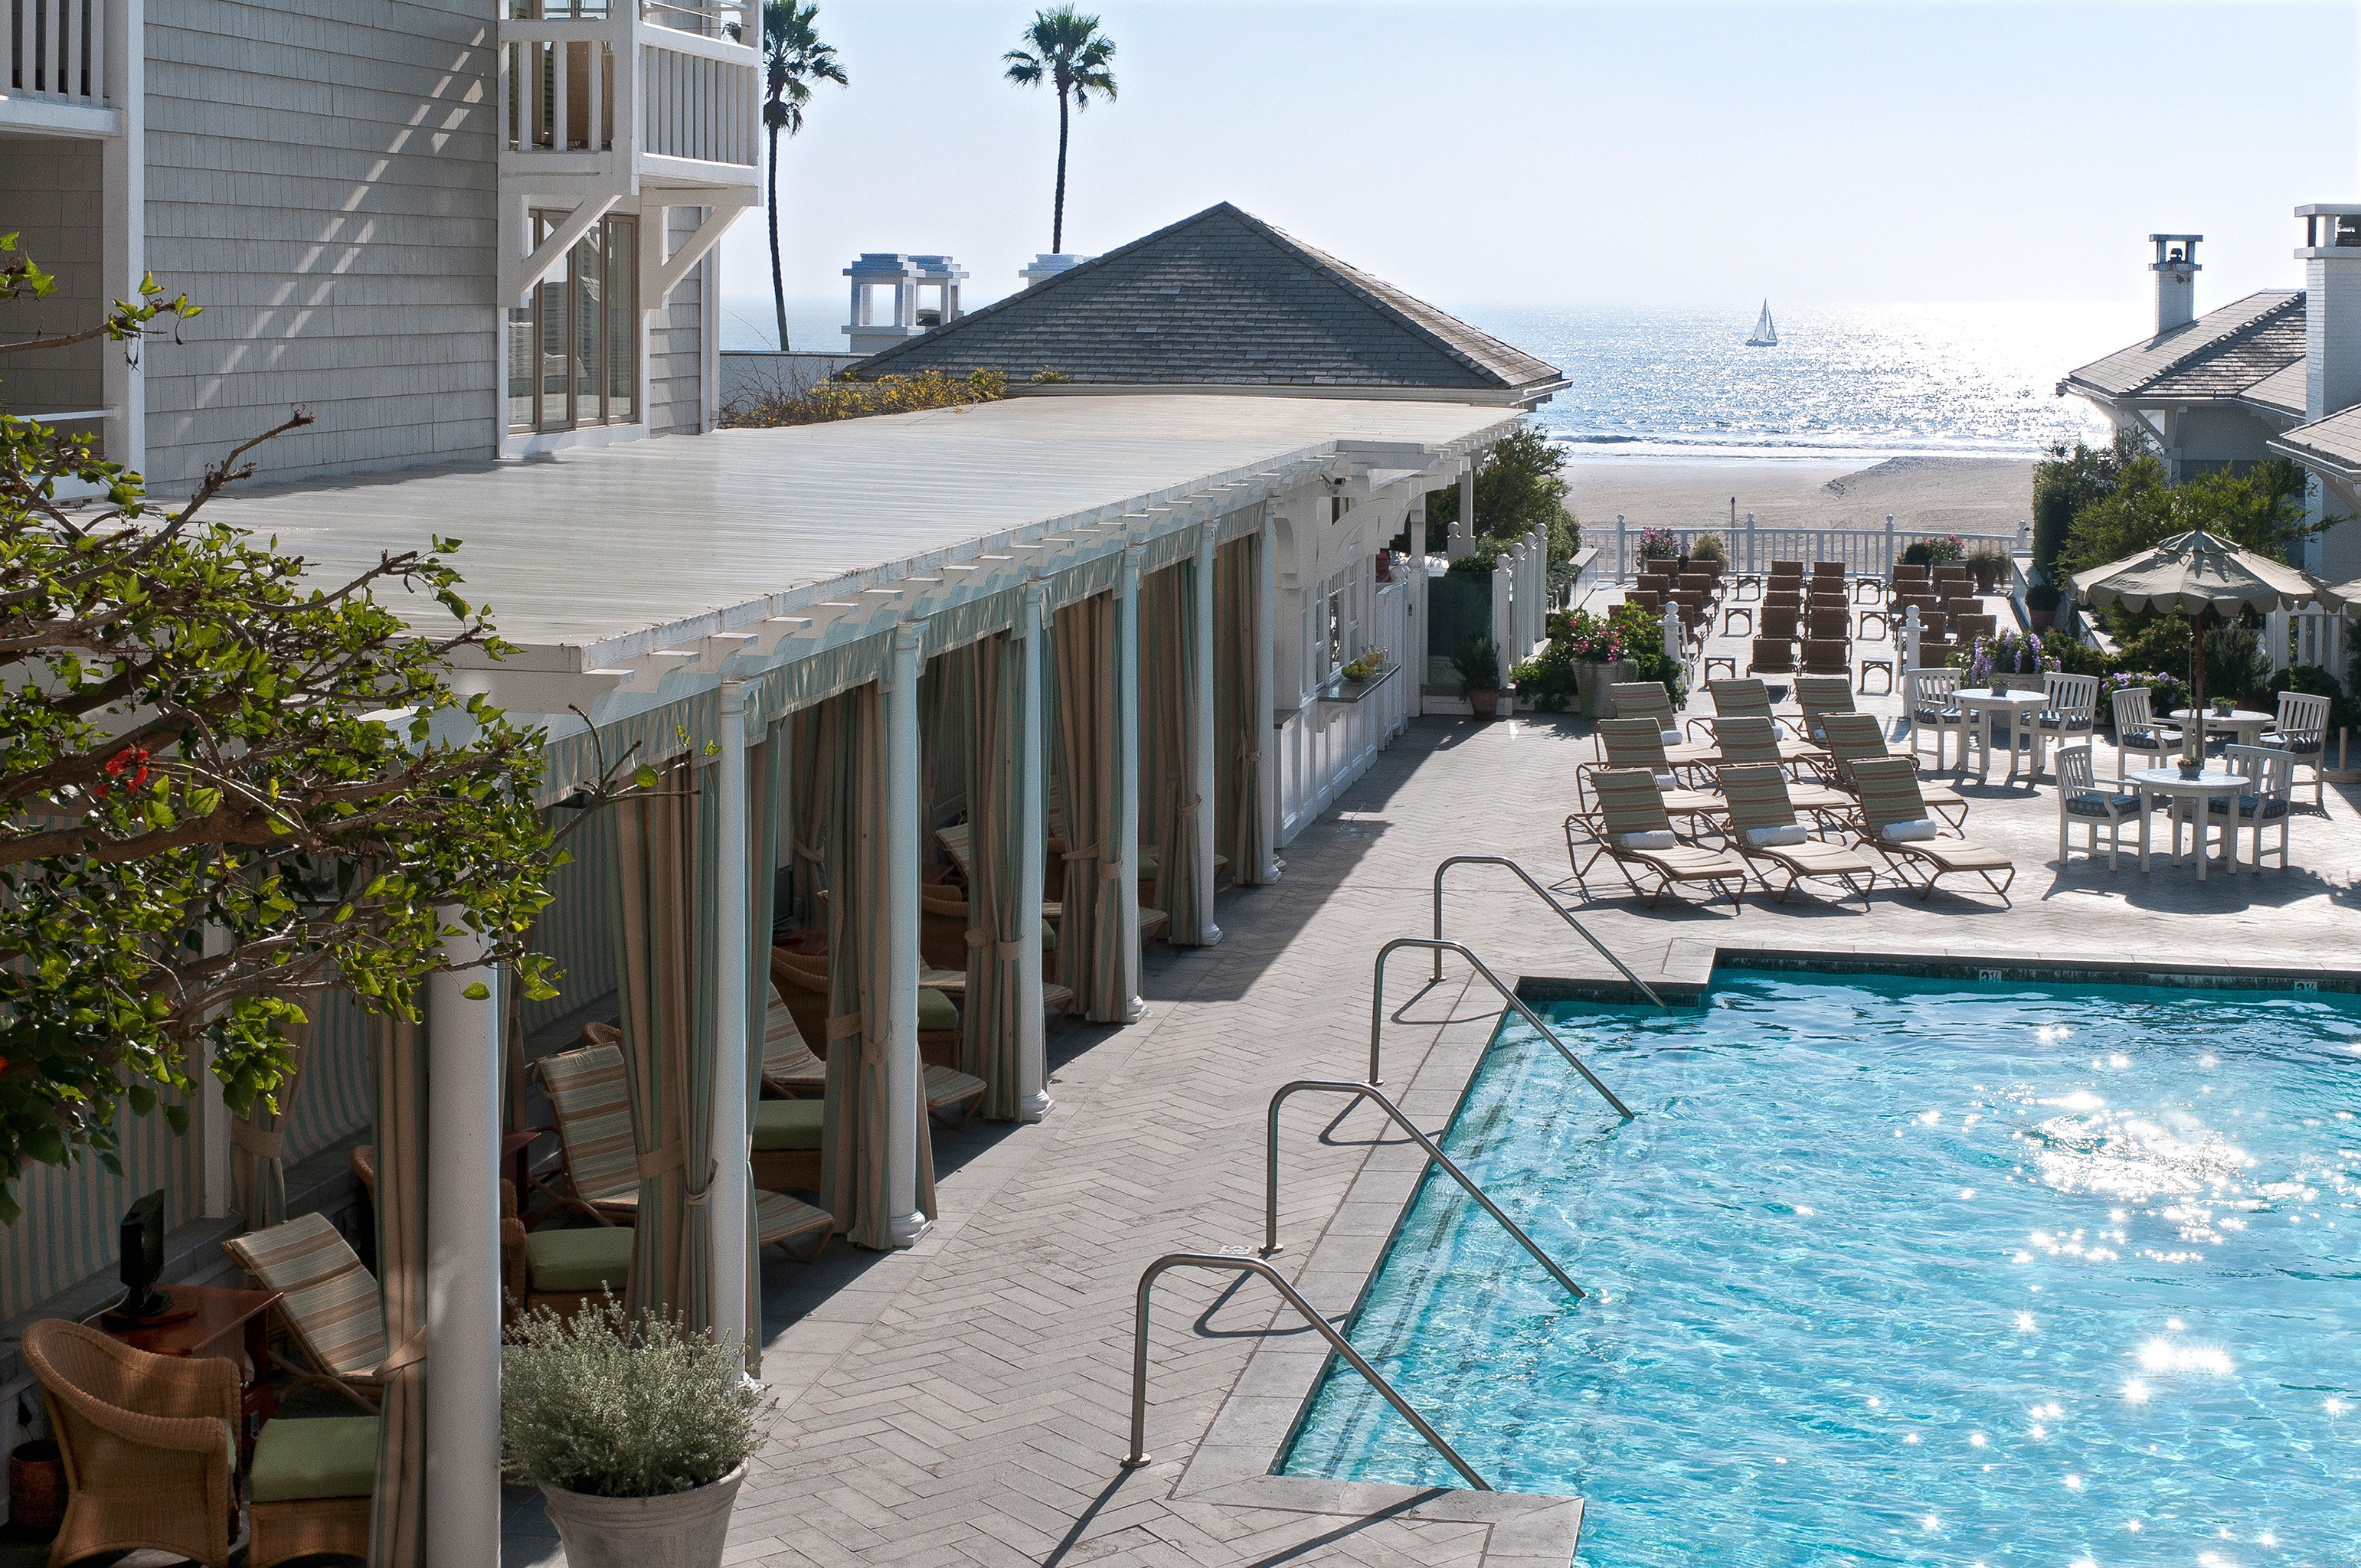 Hotels Lounge Pool building sky property swimming pool Resort home Villa backyard mansion cottage condominium palace